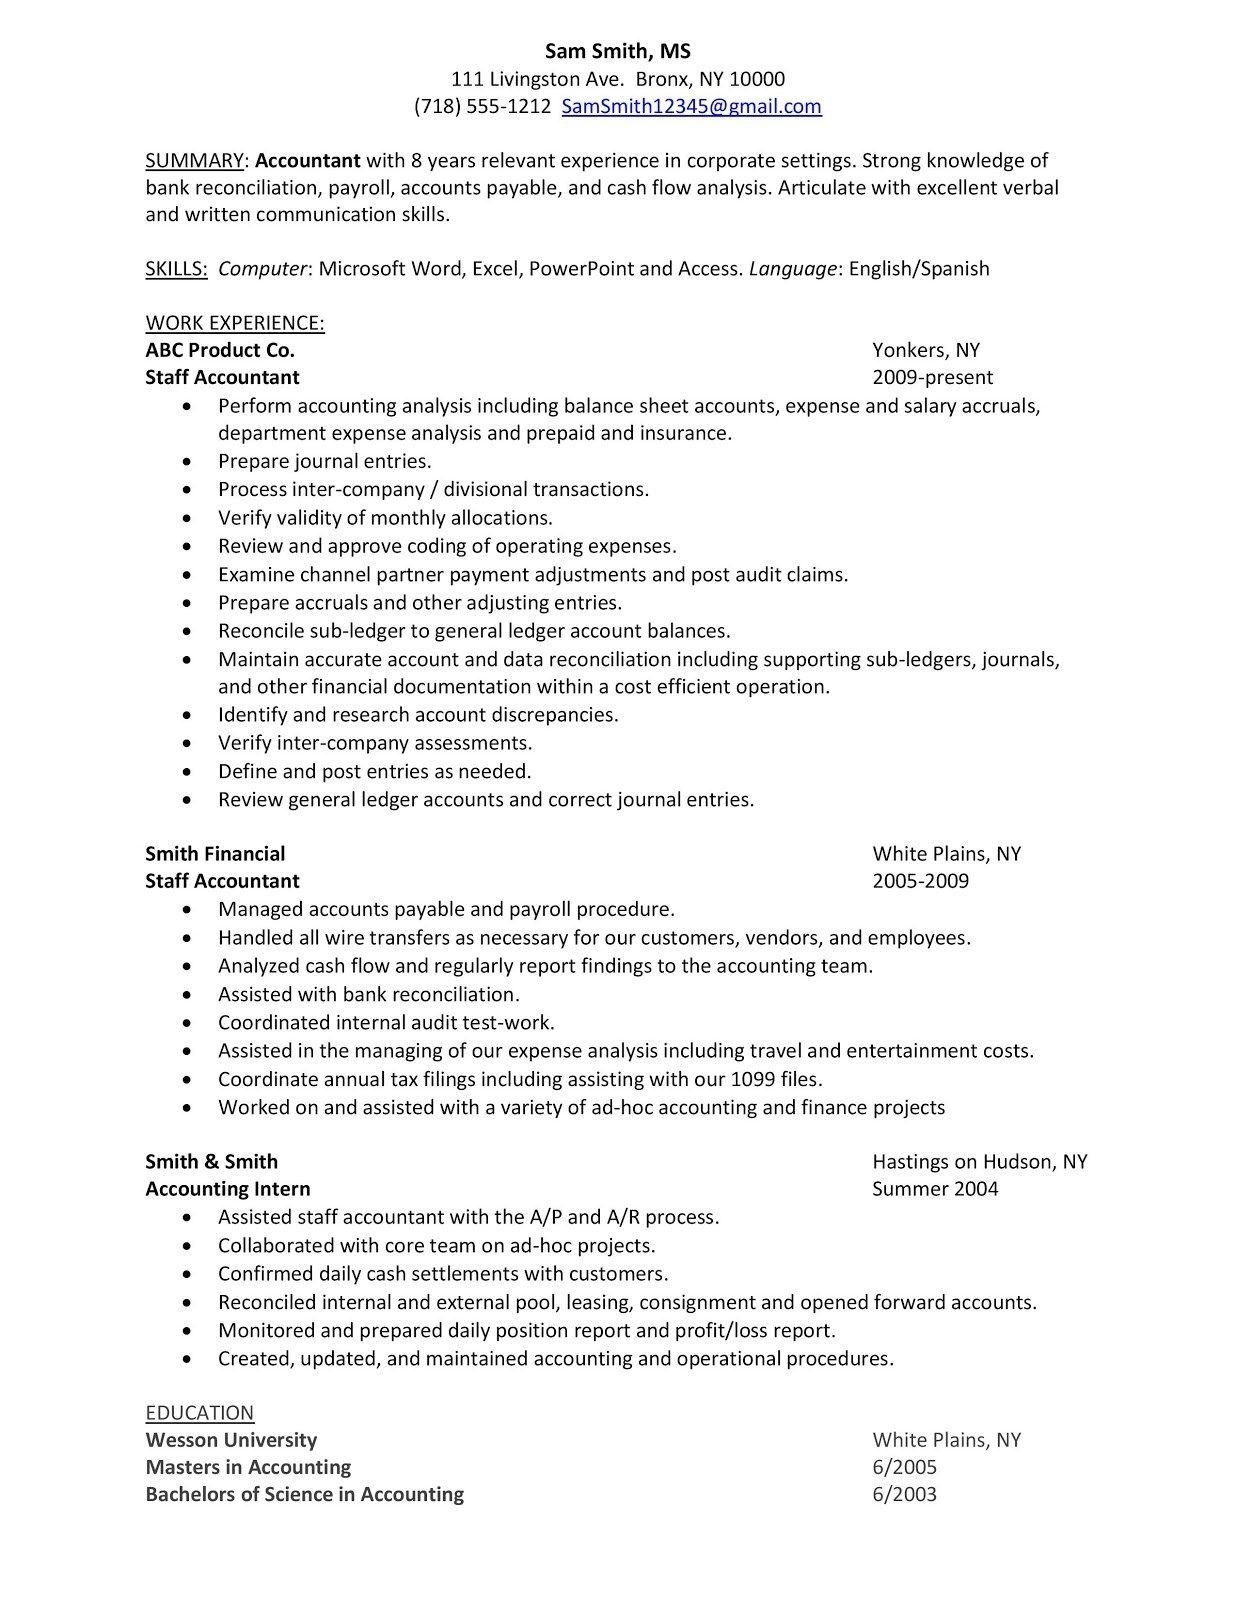 Audit Engagement Letter Sample Template Resume Builder Cover